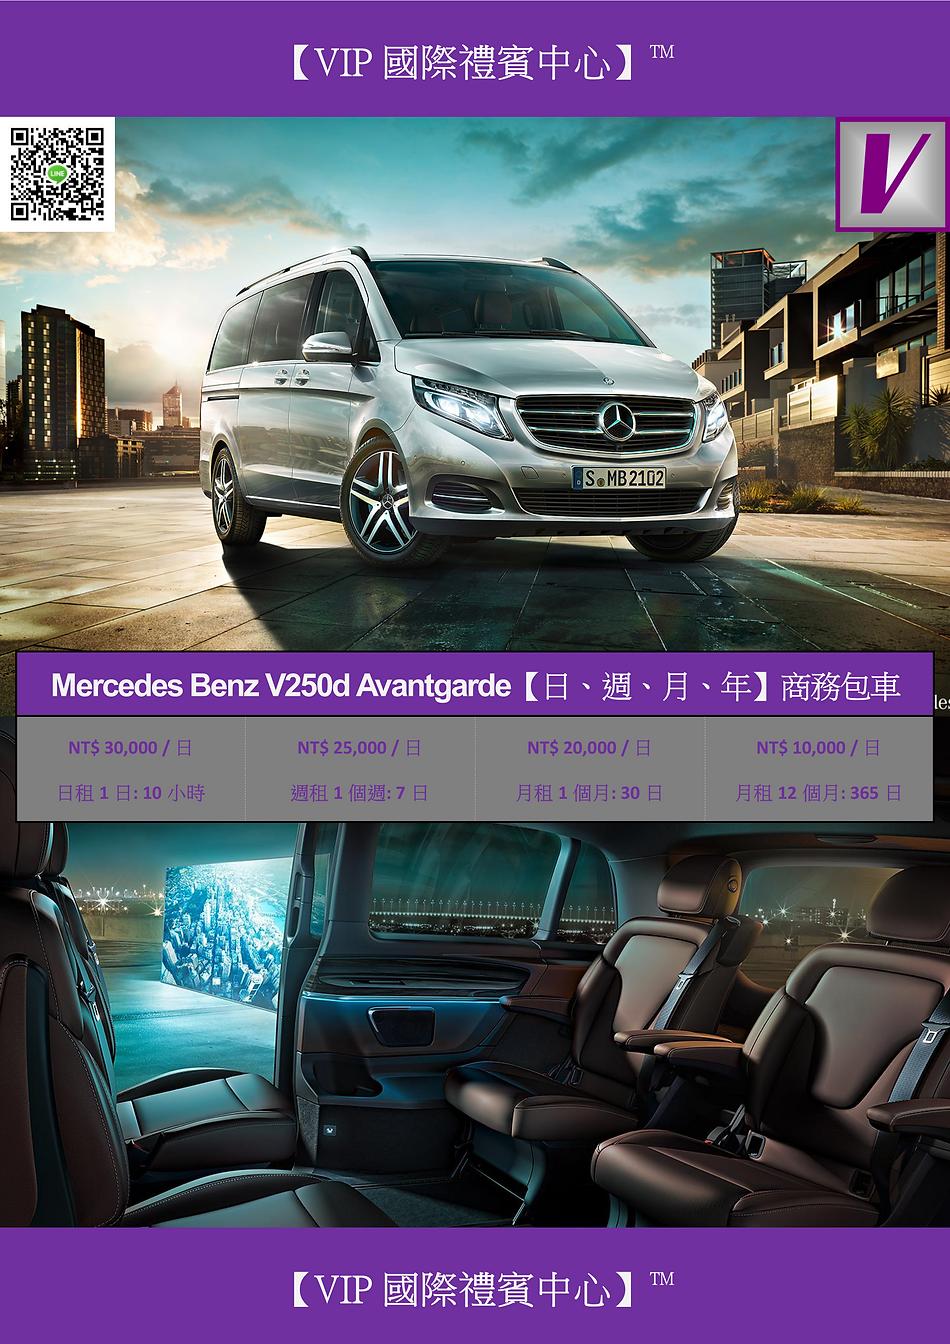 VIP國際禮賓中心 MERCEDES BENZ V250D AVANTGARDE W447 臺中市區接送包車